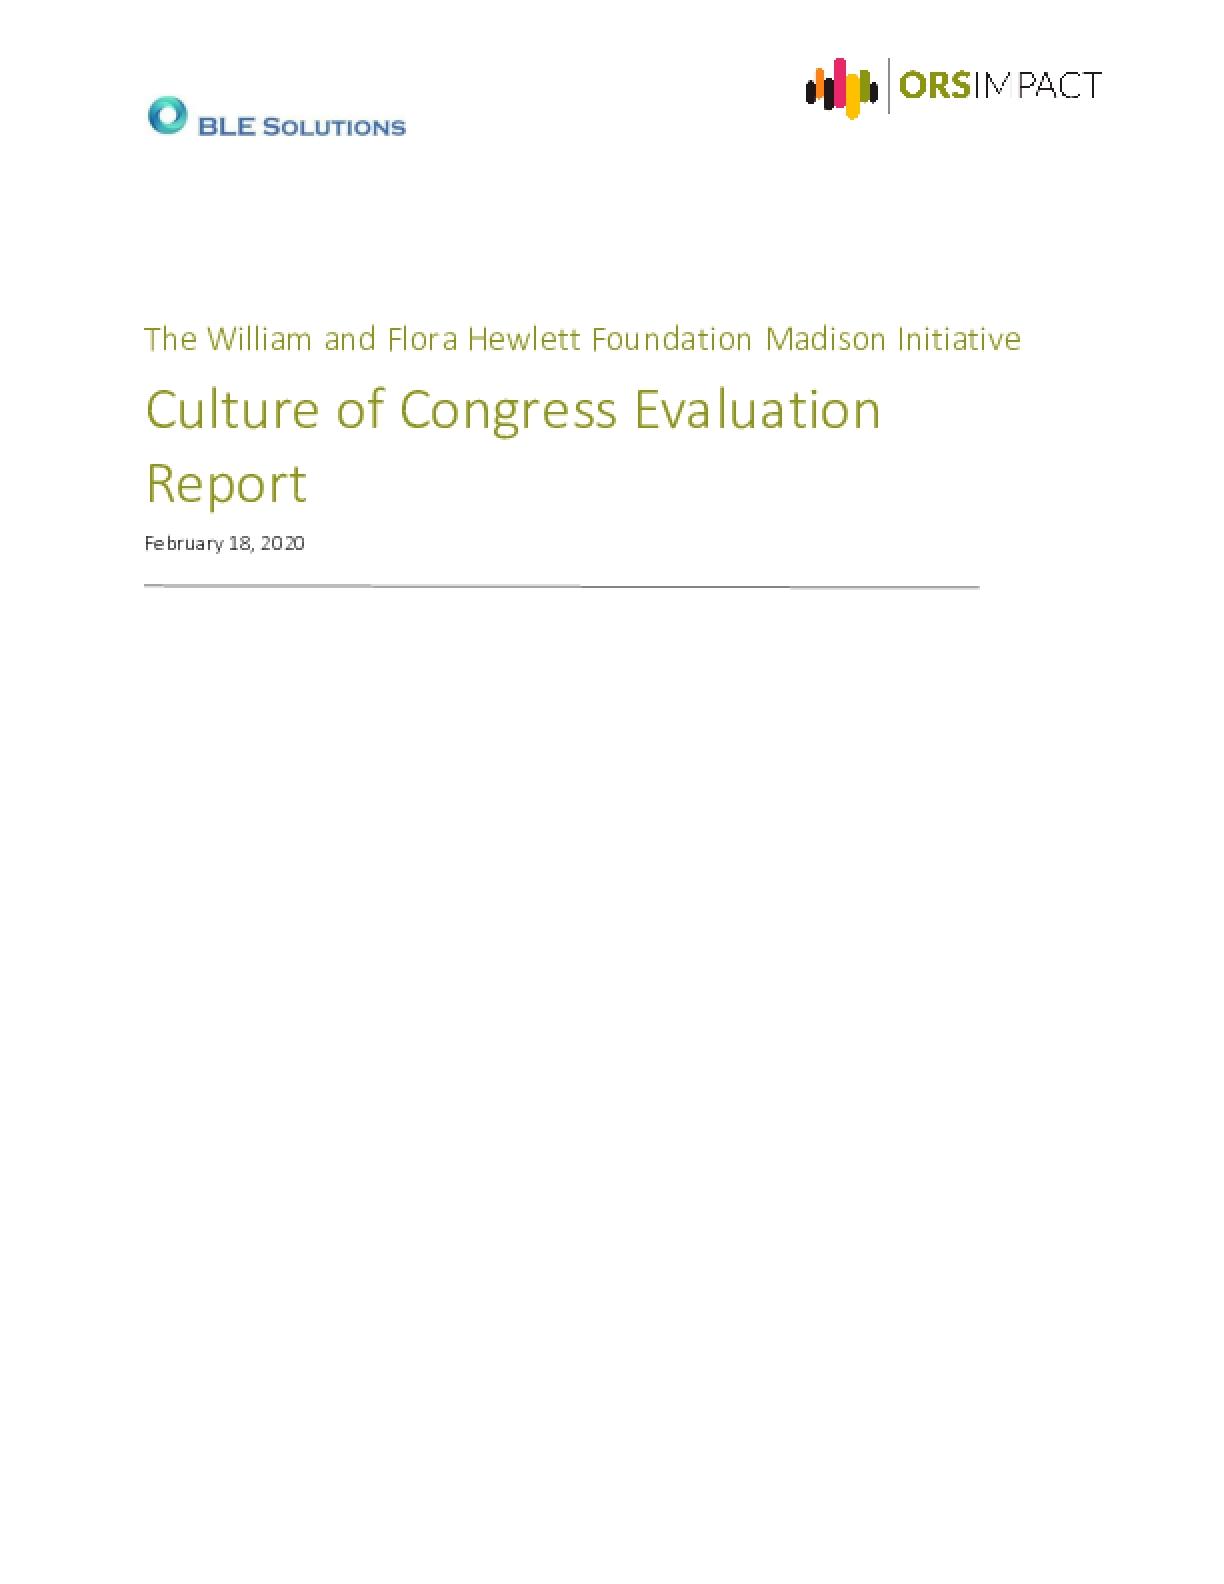 Culture of Congress Evaluation Report